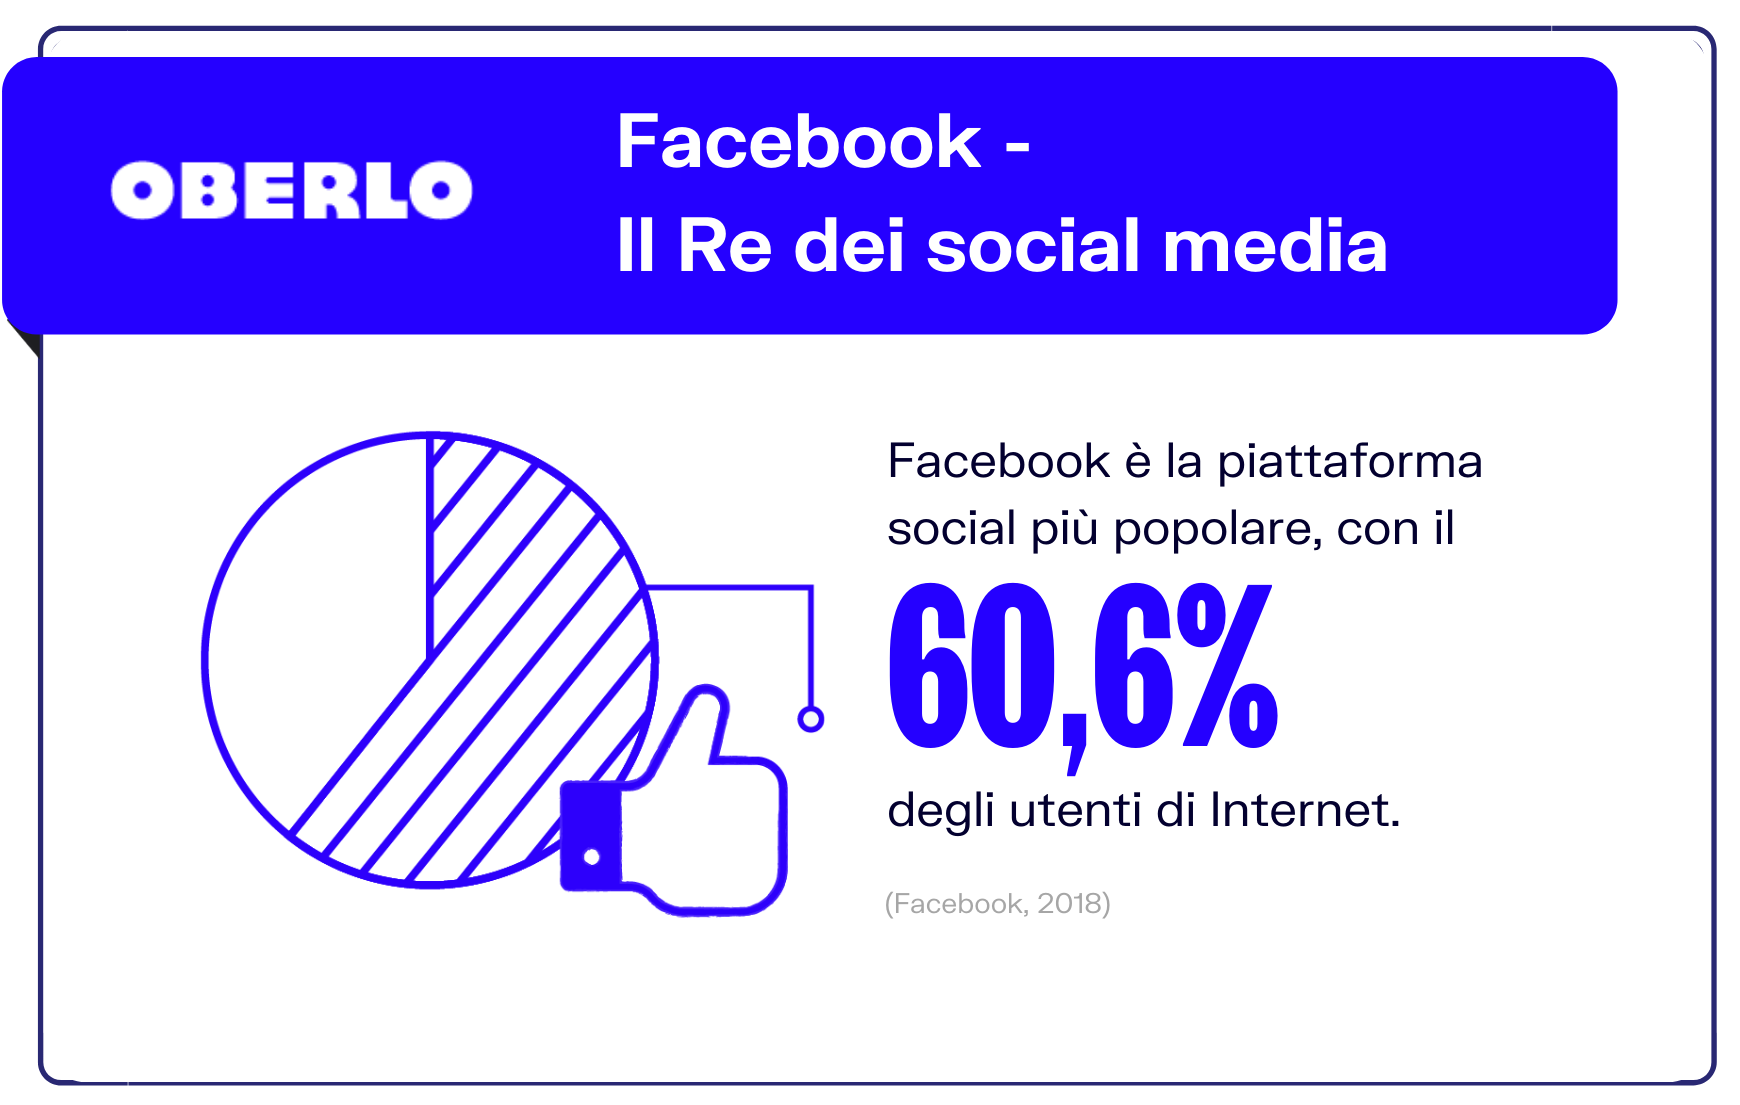 statistiche facebook social